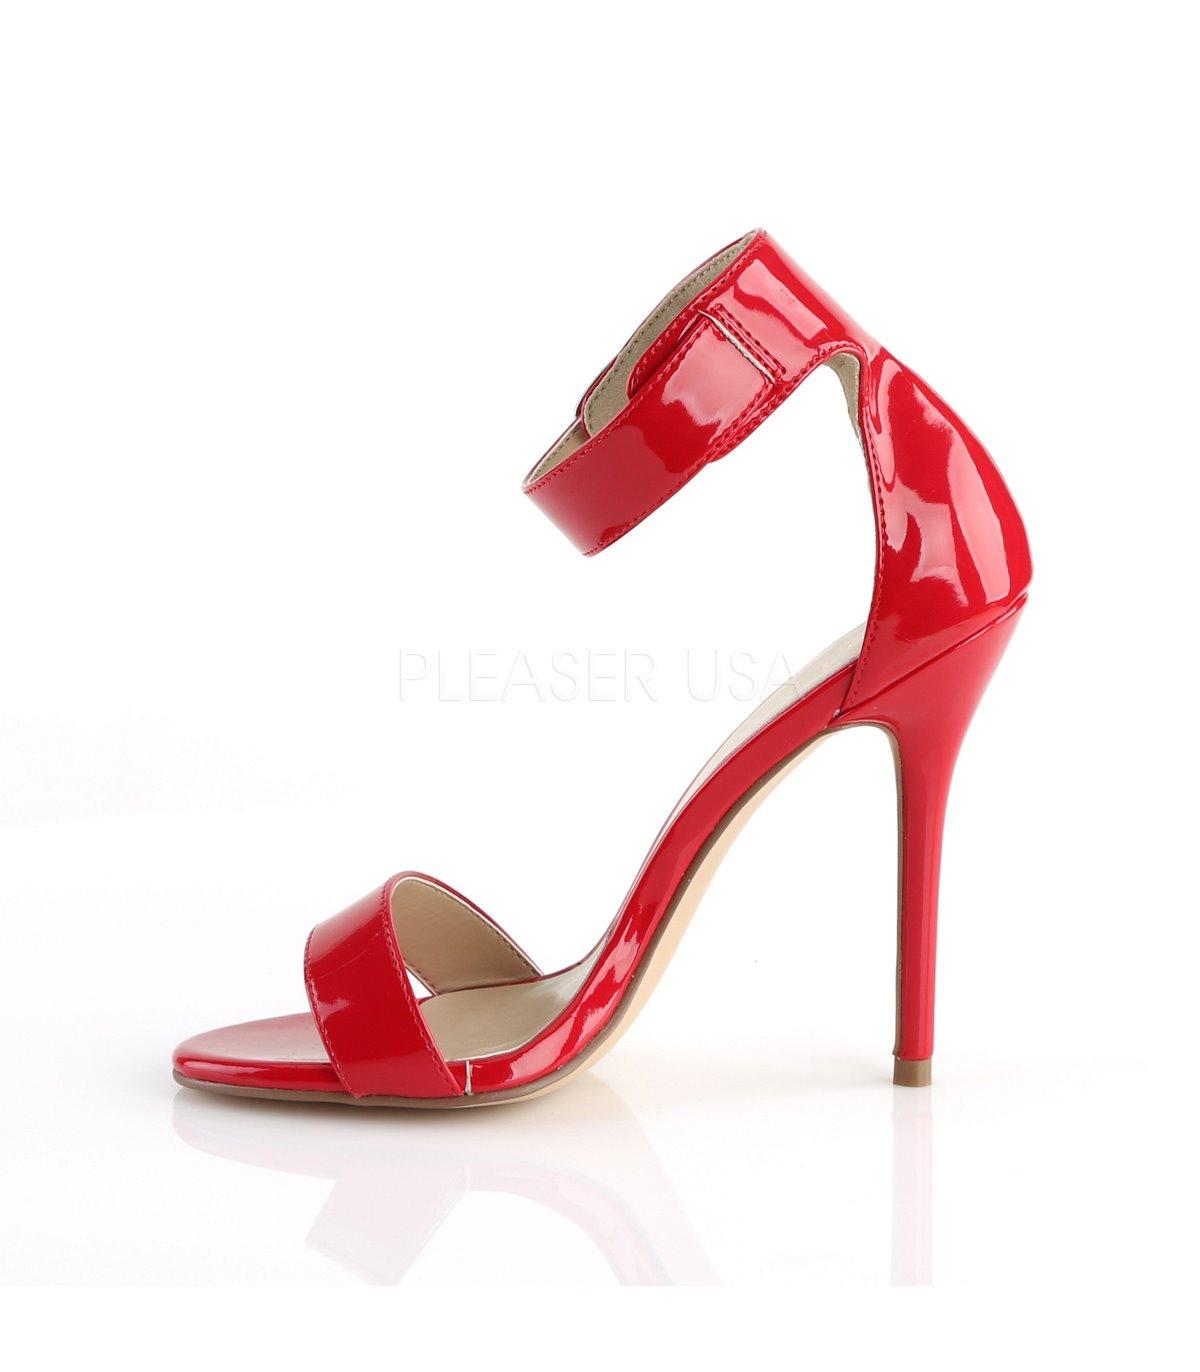 0b060e58927cf Kaufen Pleaser Sandaletten Online 10 Amuse Dxboerc Rot wmvN8nO0